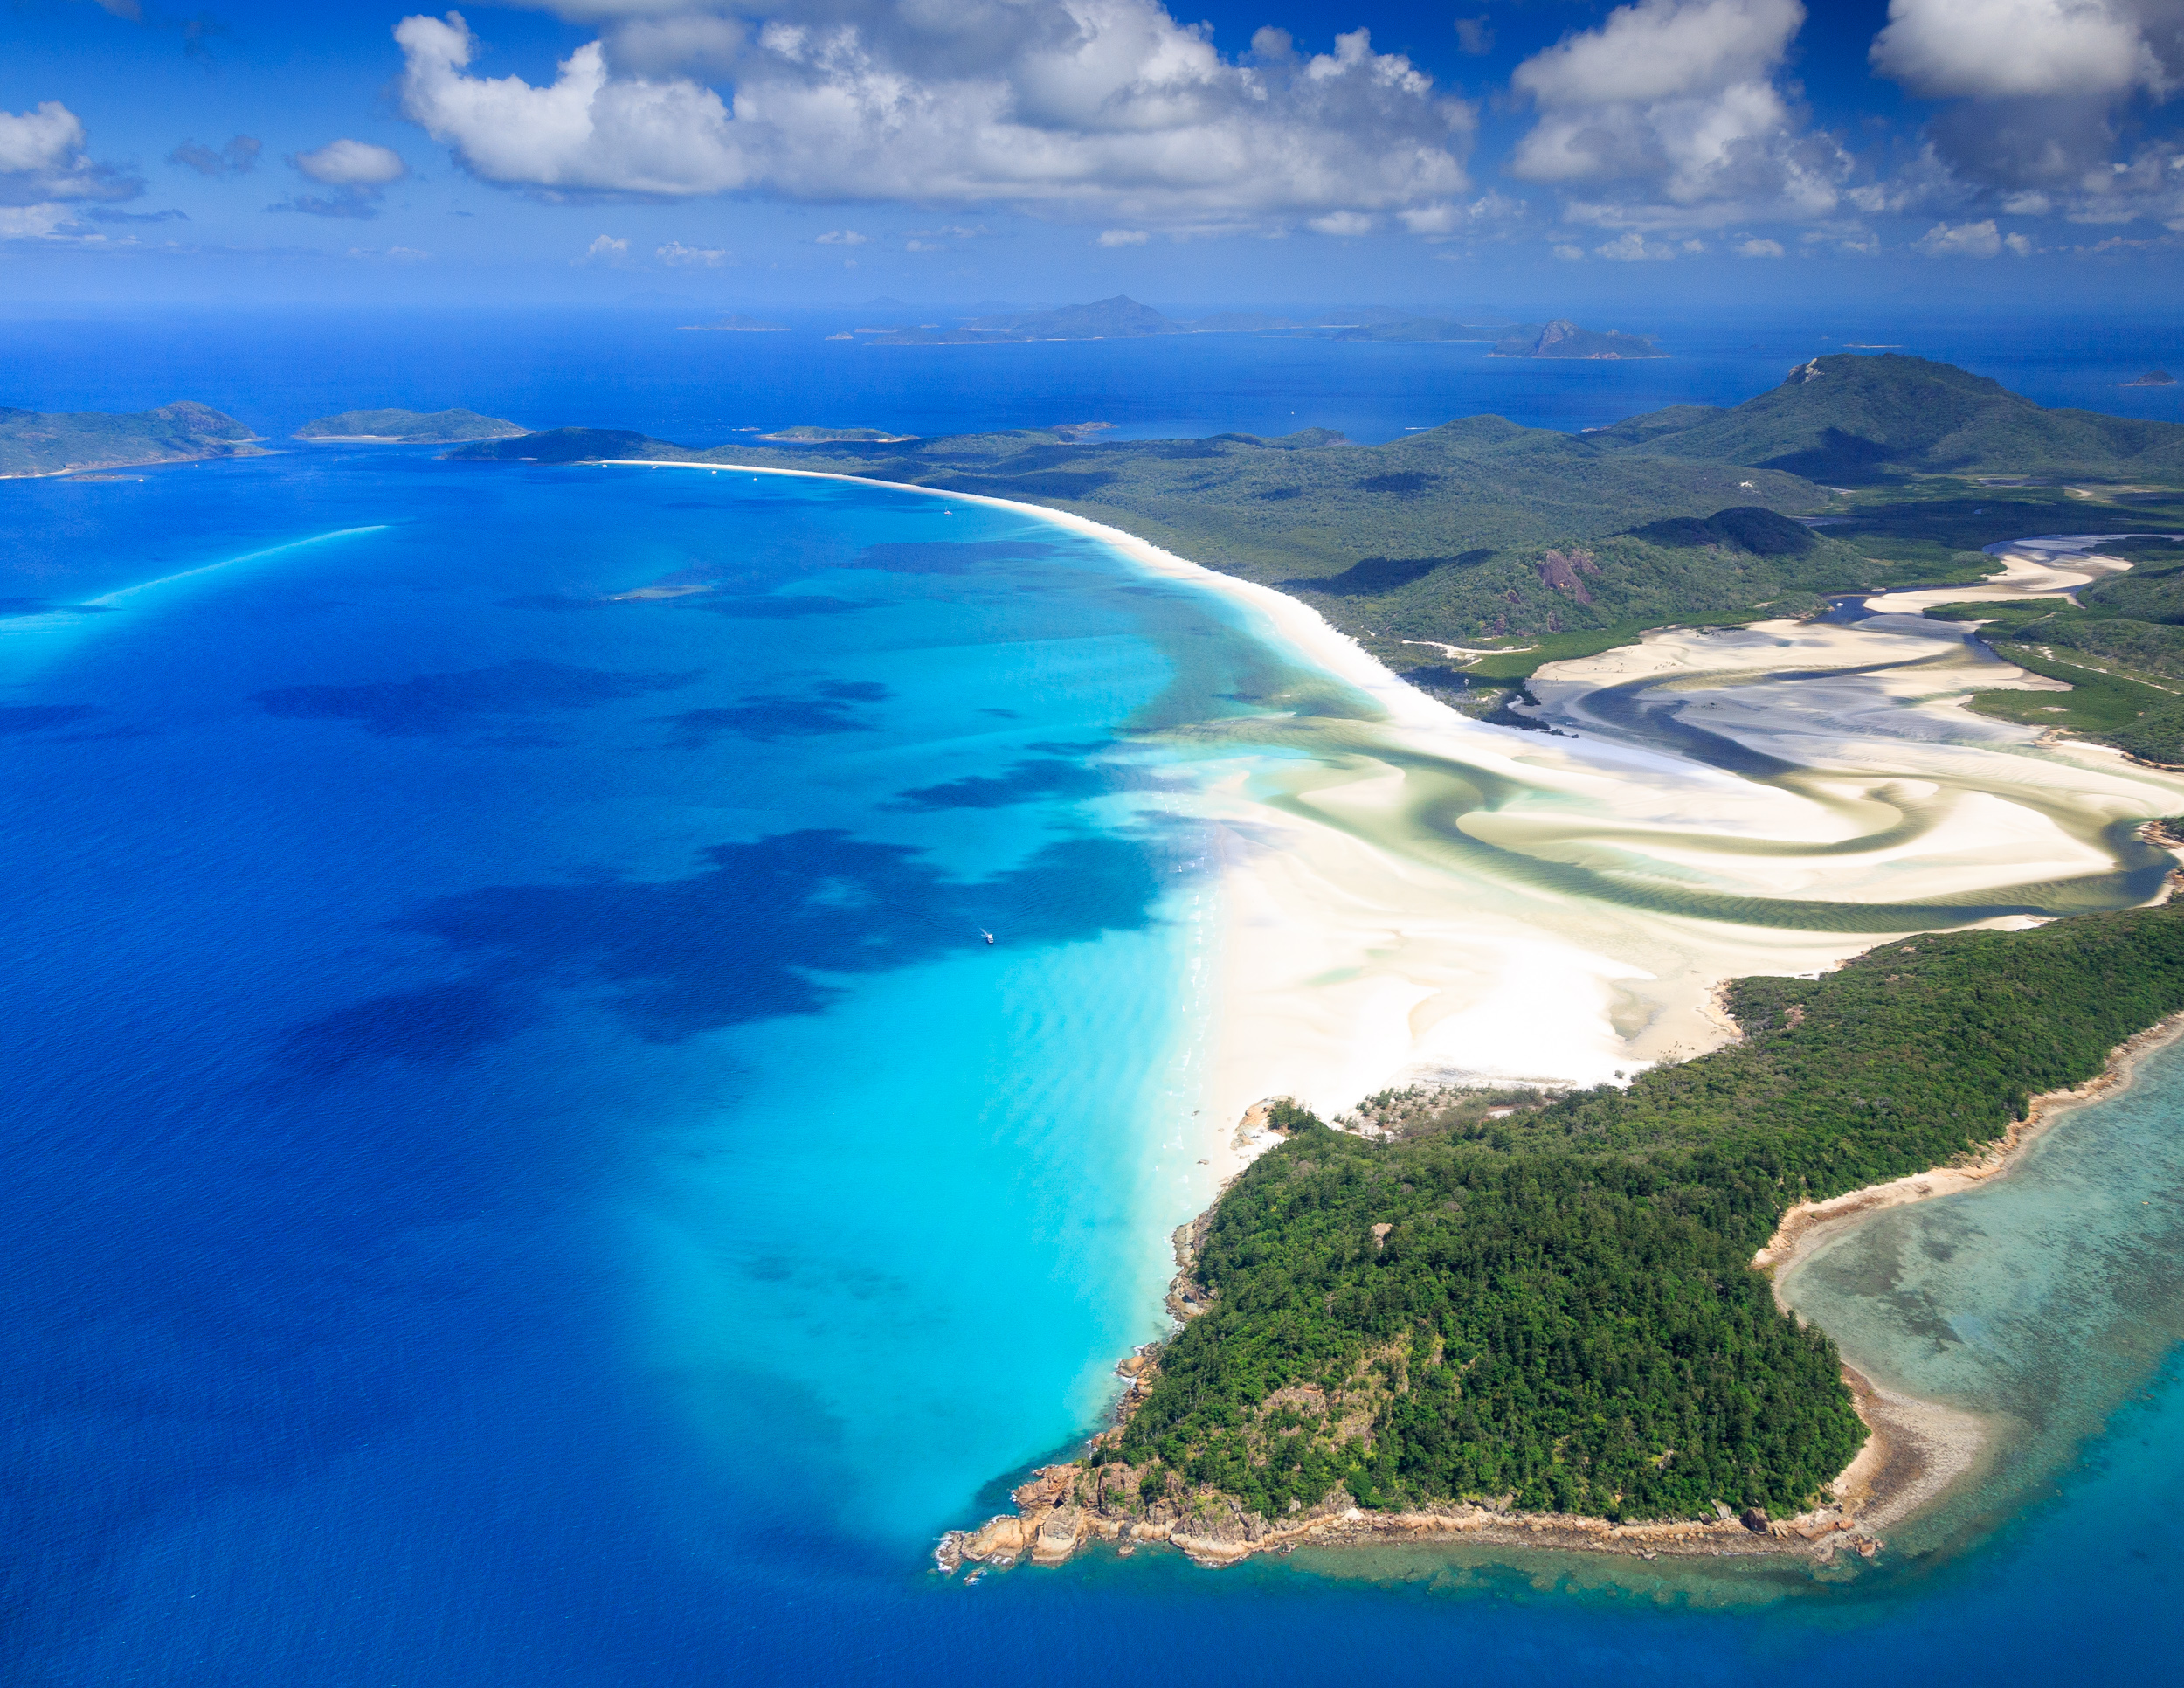 Whitehaven Beach, The Whitsundays, Queensland